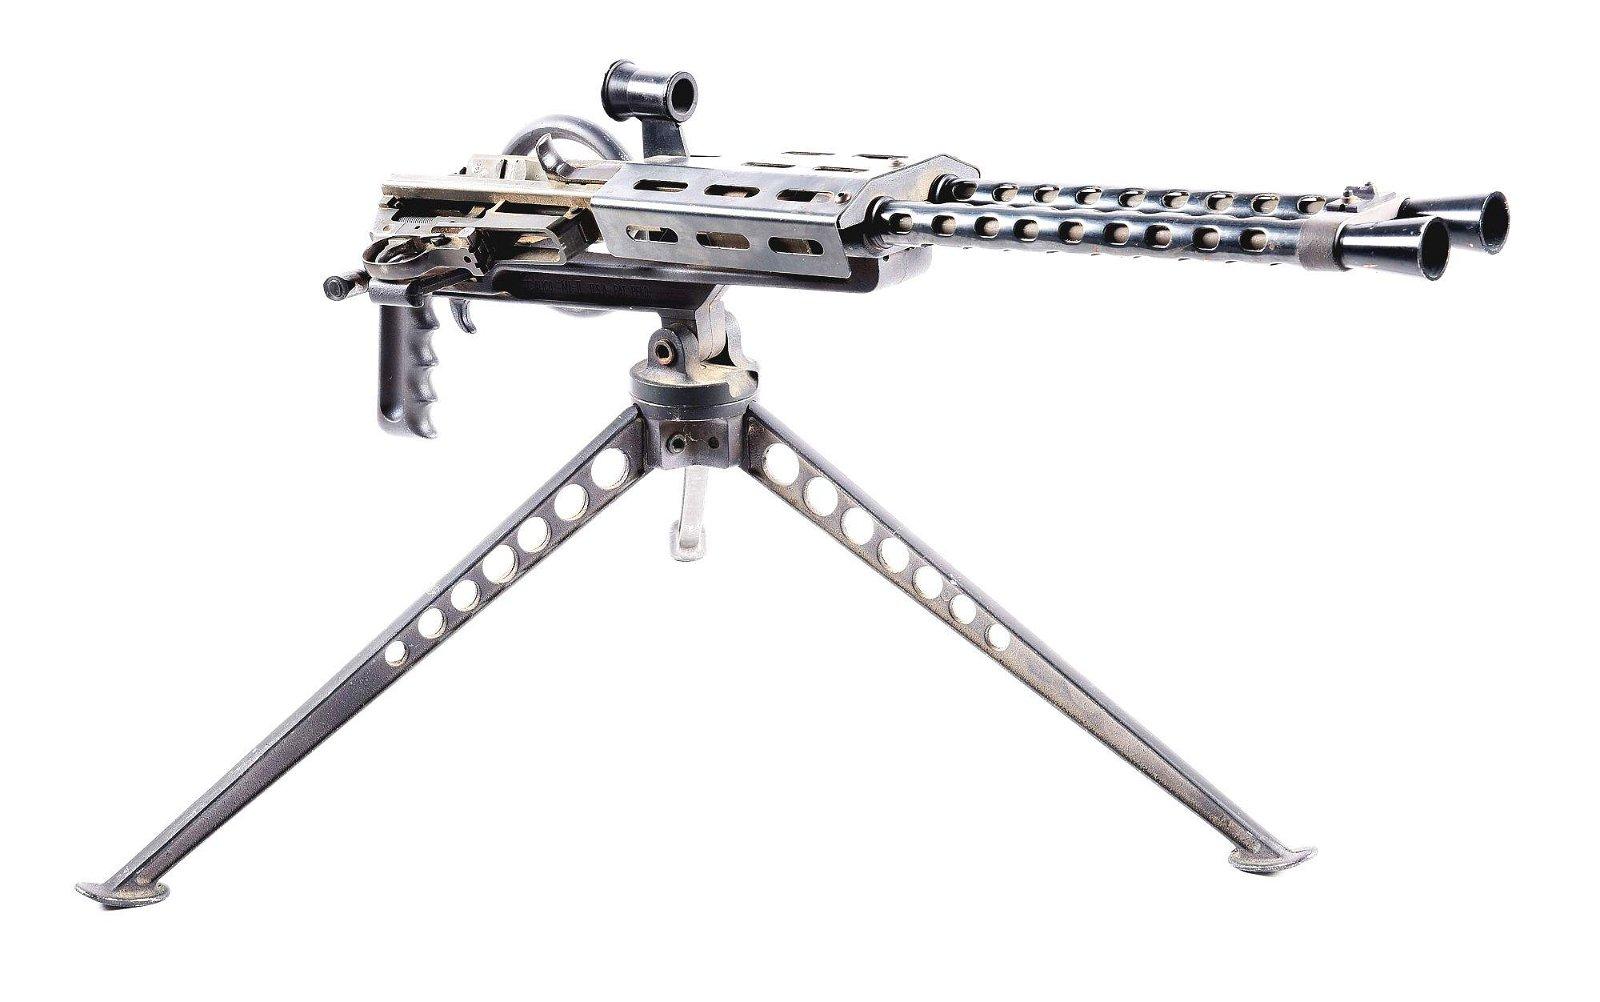 (C) CALICO M-1 II .30 SEMI AUTOMATIC RIFLES GATLING GUN